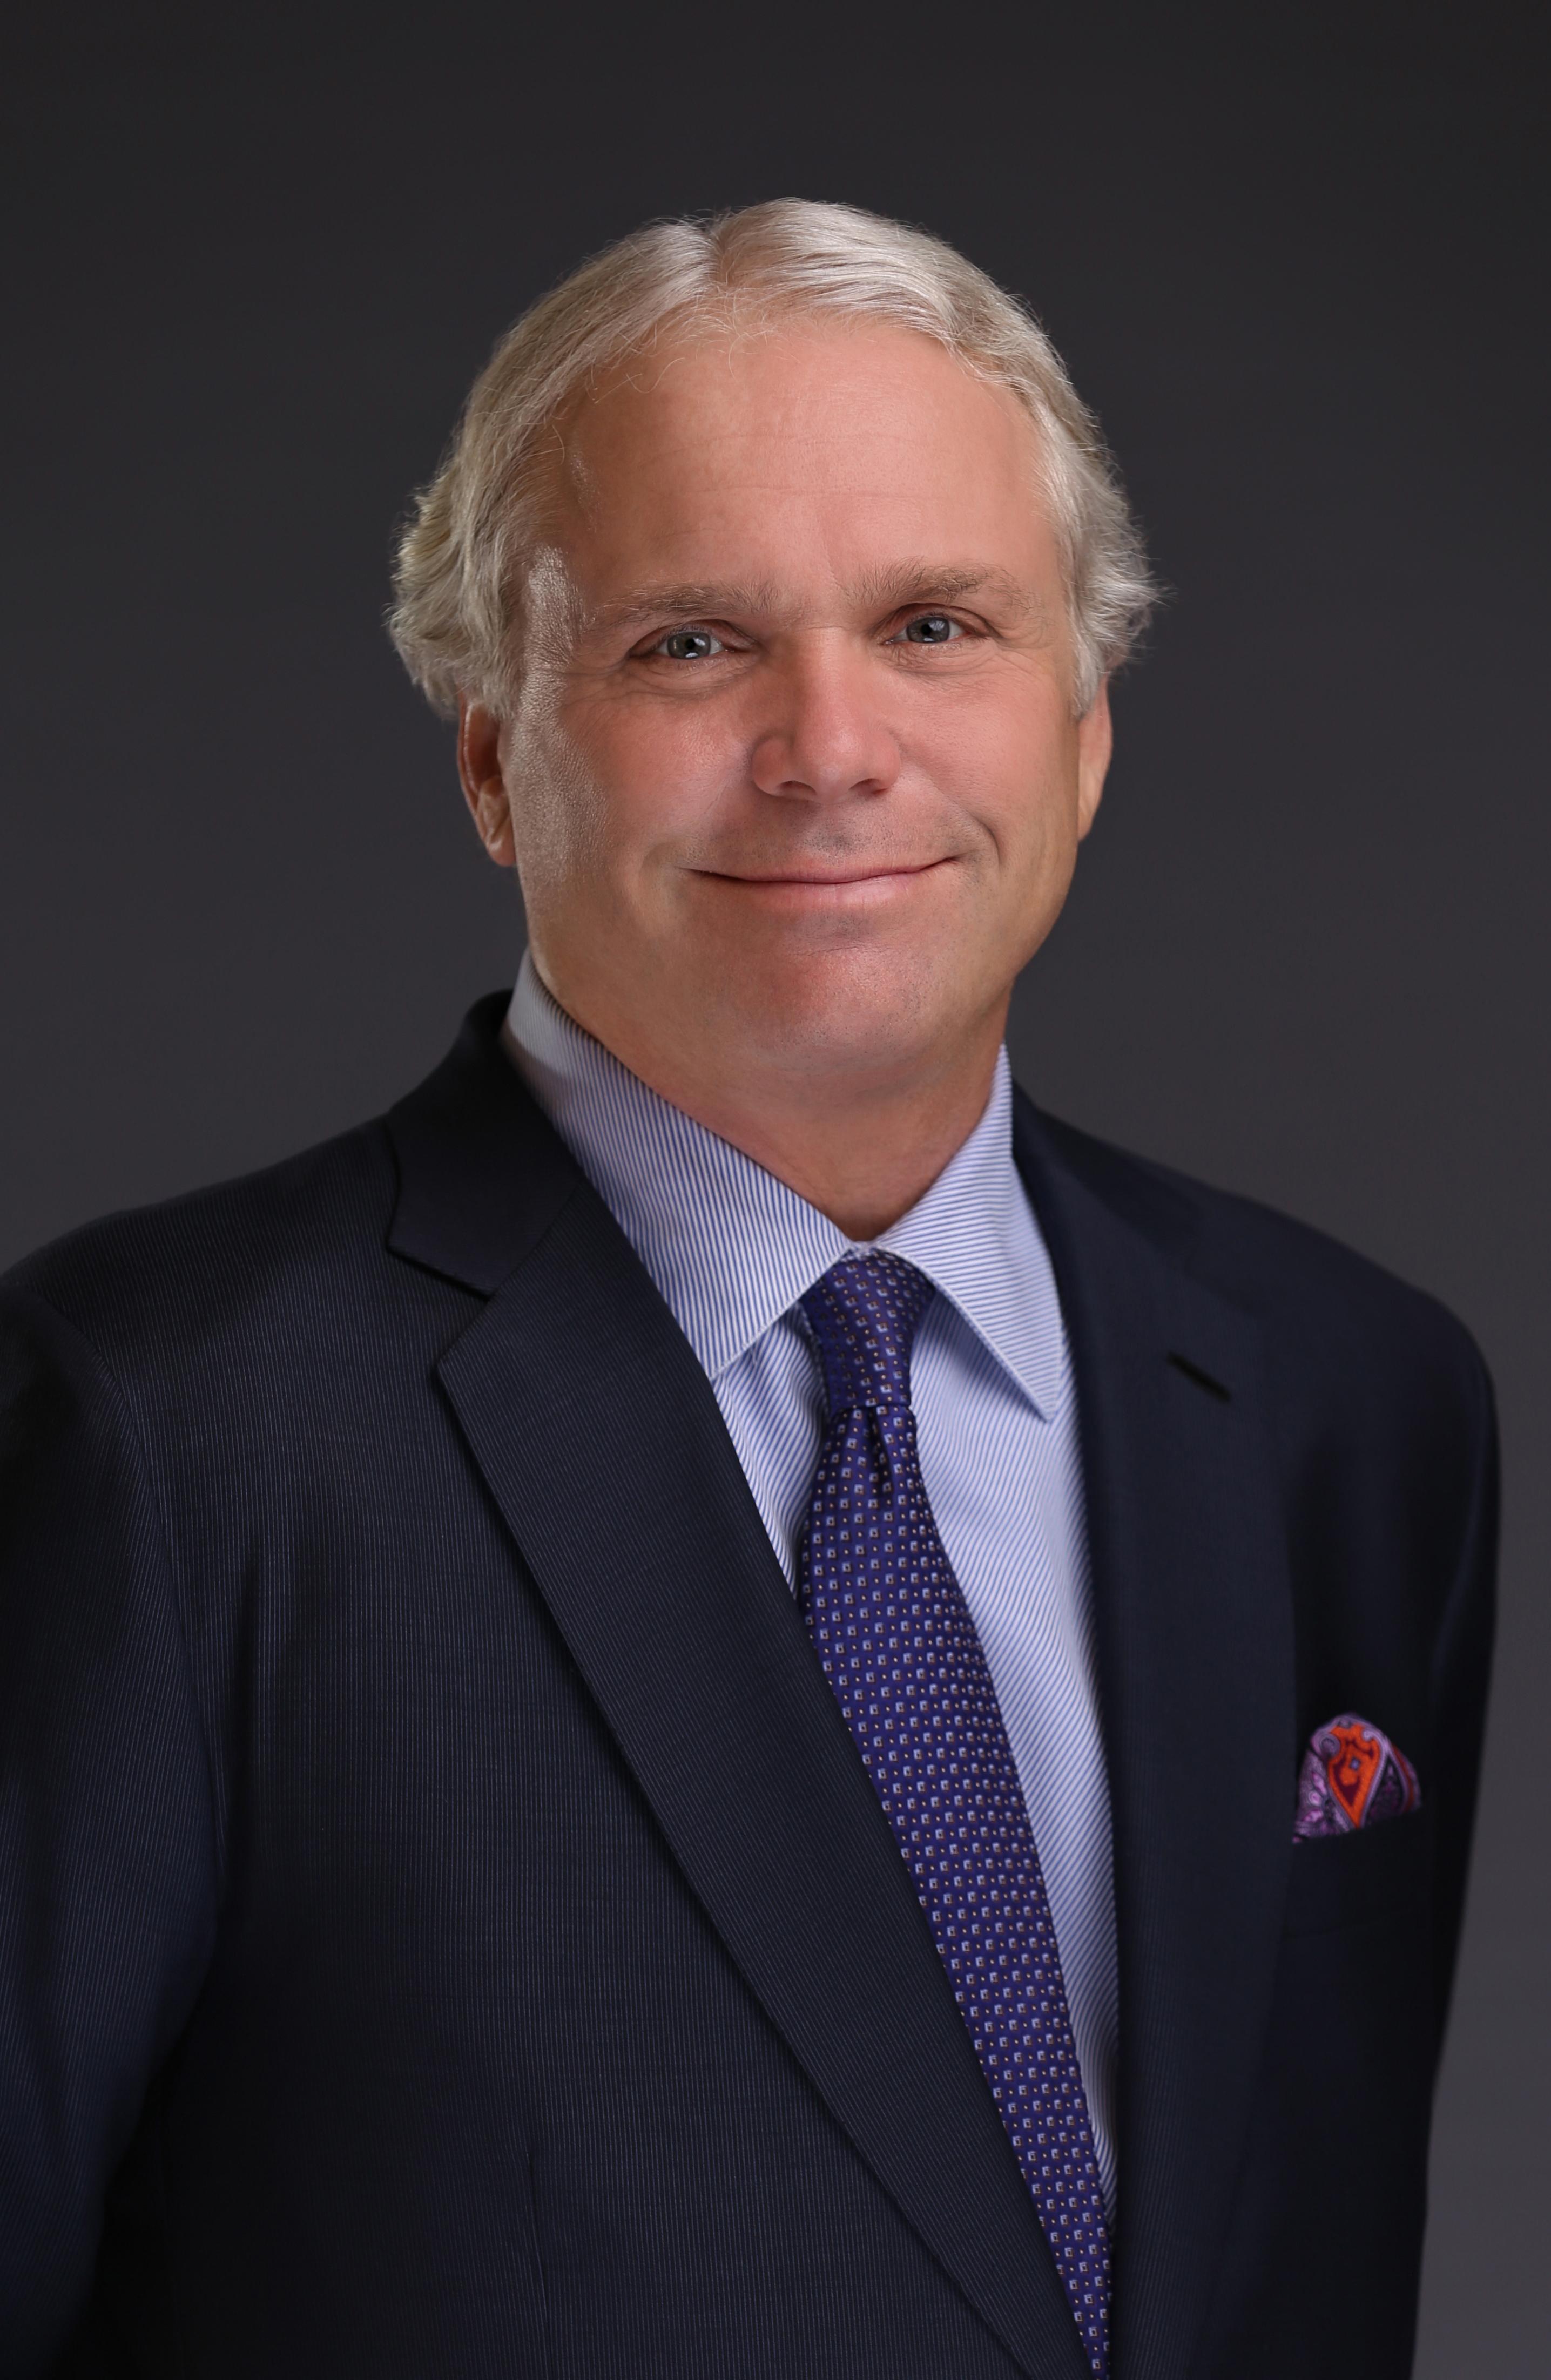 Bartholomew J. Dalton, President, ACTL  (Photo: Business Wire)